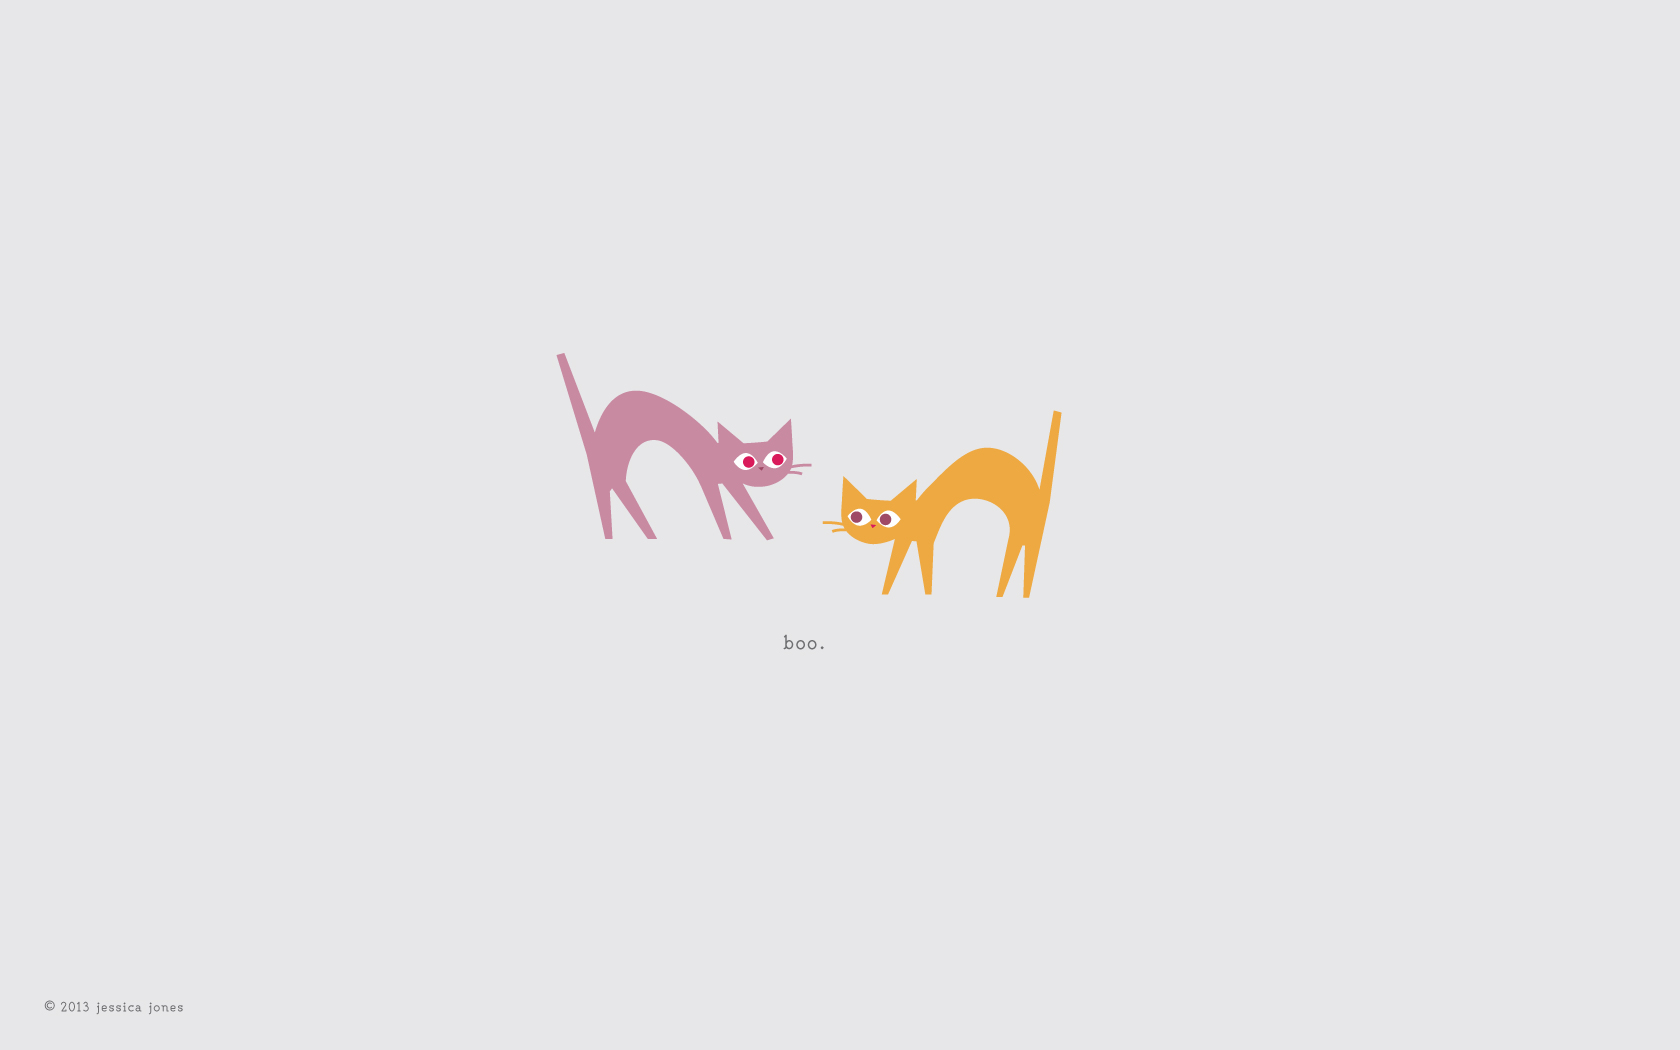 Indie Desktop Backgrounds Tumblr Popular Photography 1680x1050